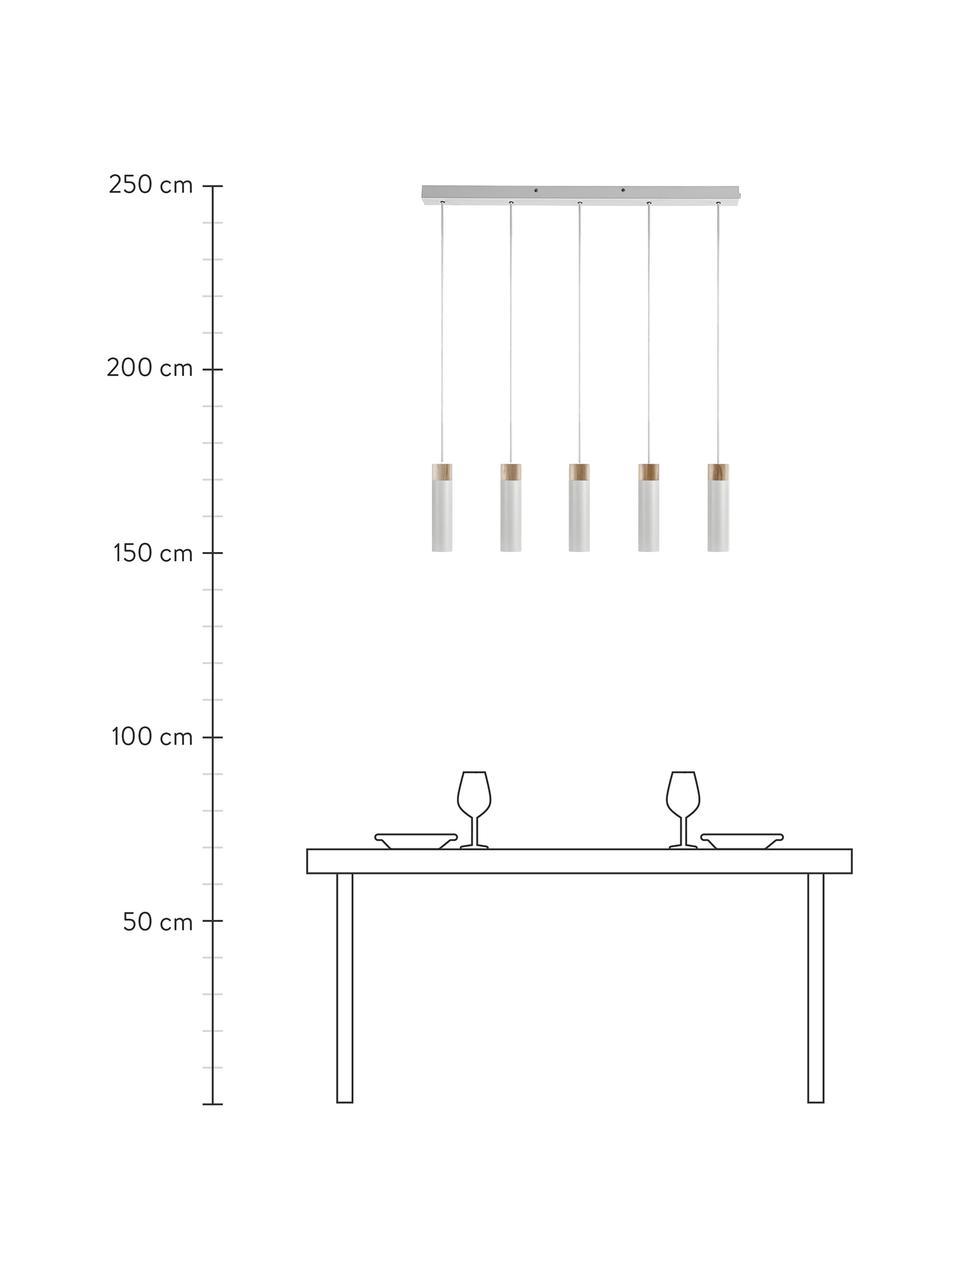 Große Pendelleuchte Tilo in Grau mit Holz-Dekor, Lampenschirm: Metall, beschichtet, Dekor: Holz, Baldachin: Metall, beschichtet, Grau, Braun, 81 x 25 cm